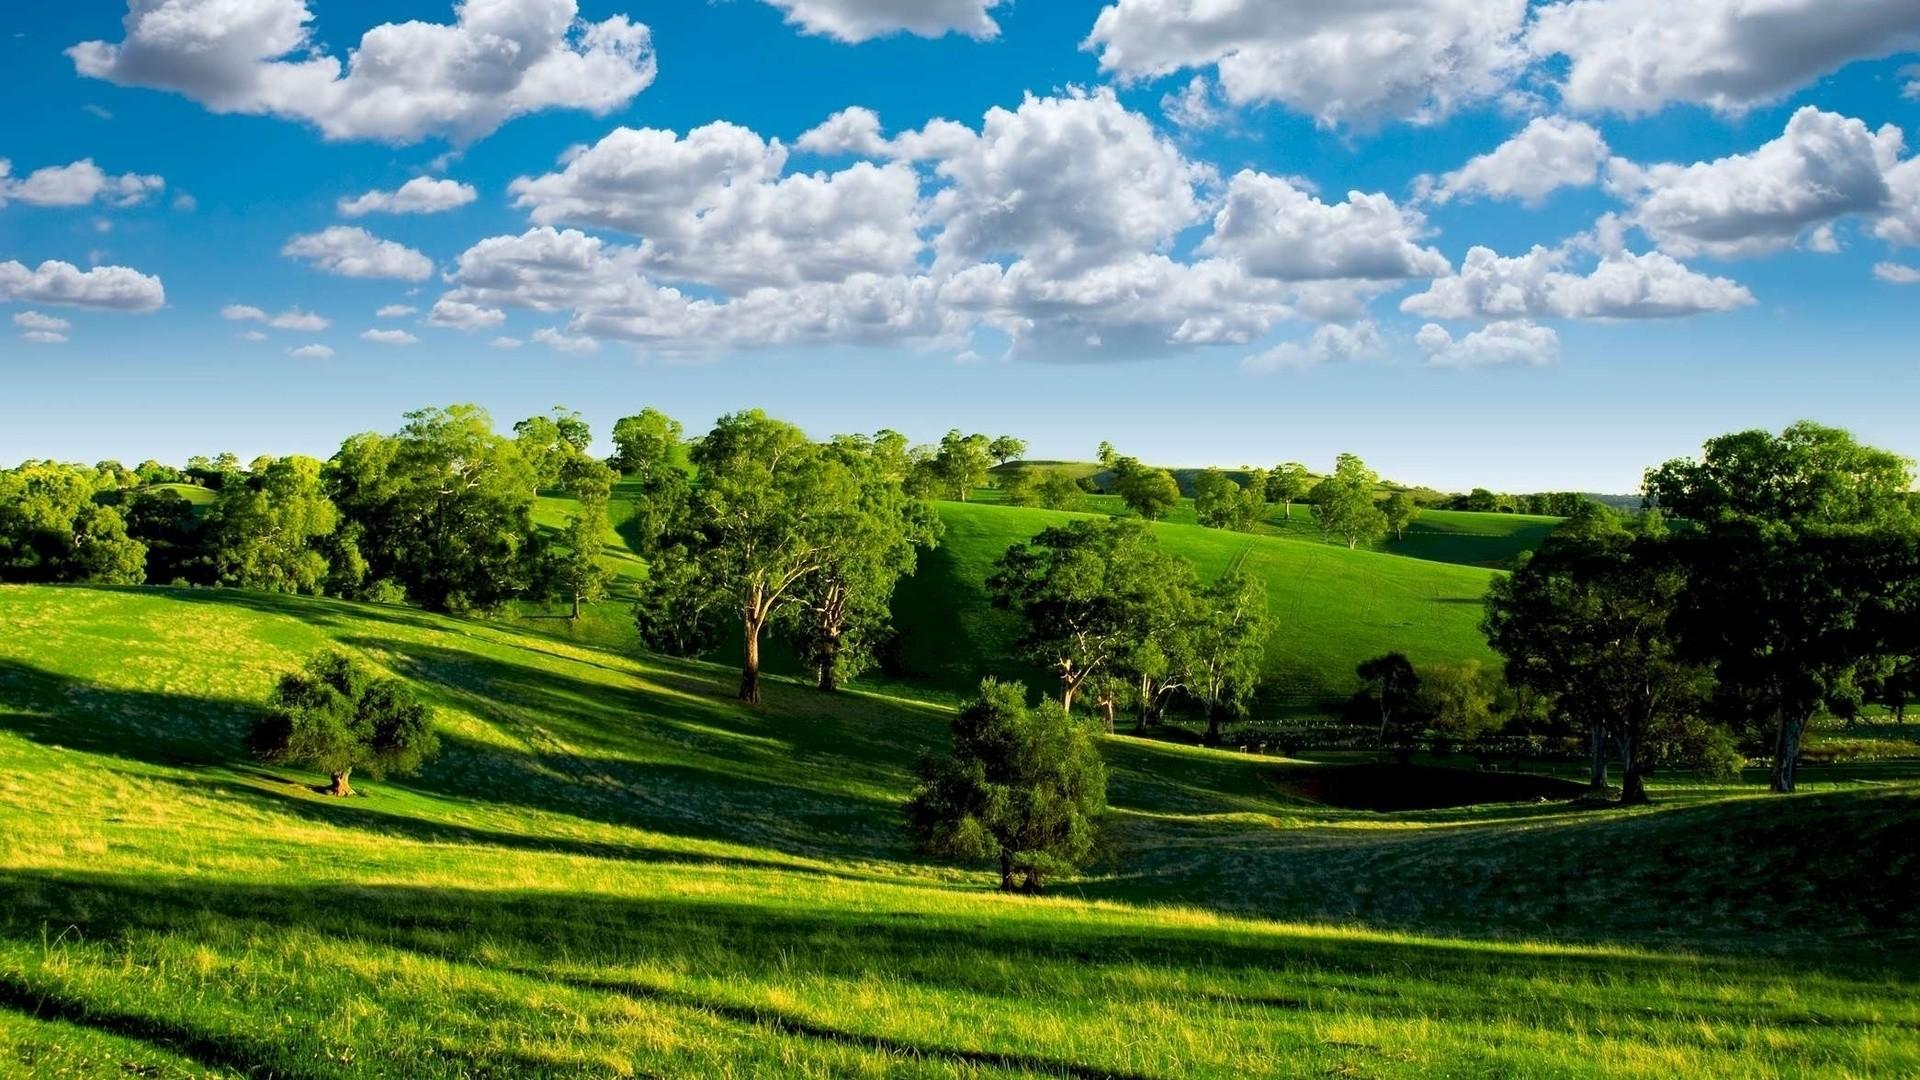 Wallpaper summer, hills, trees, green, meadows, clouds, sky,